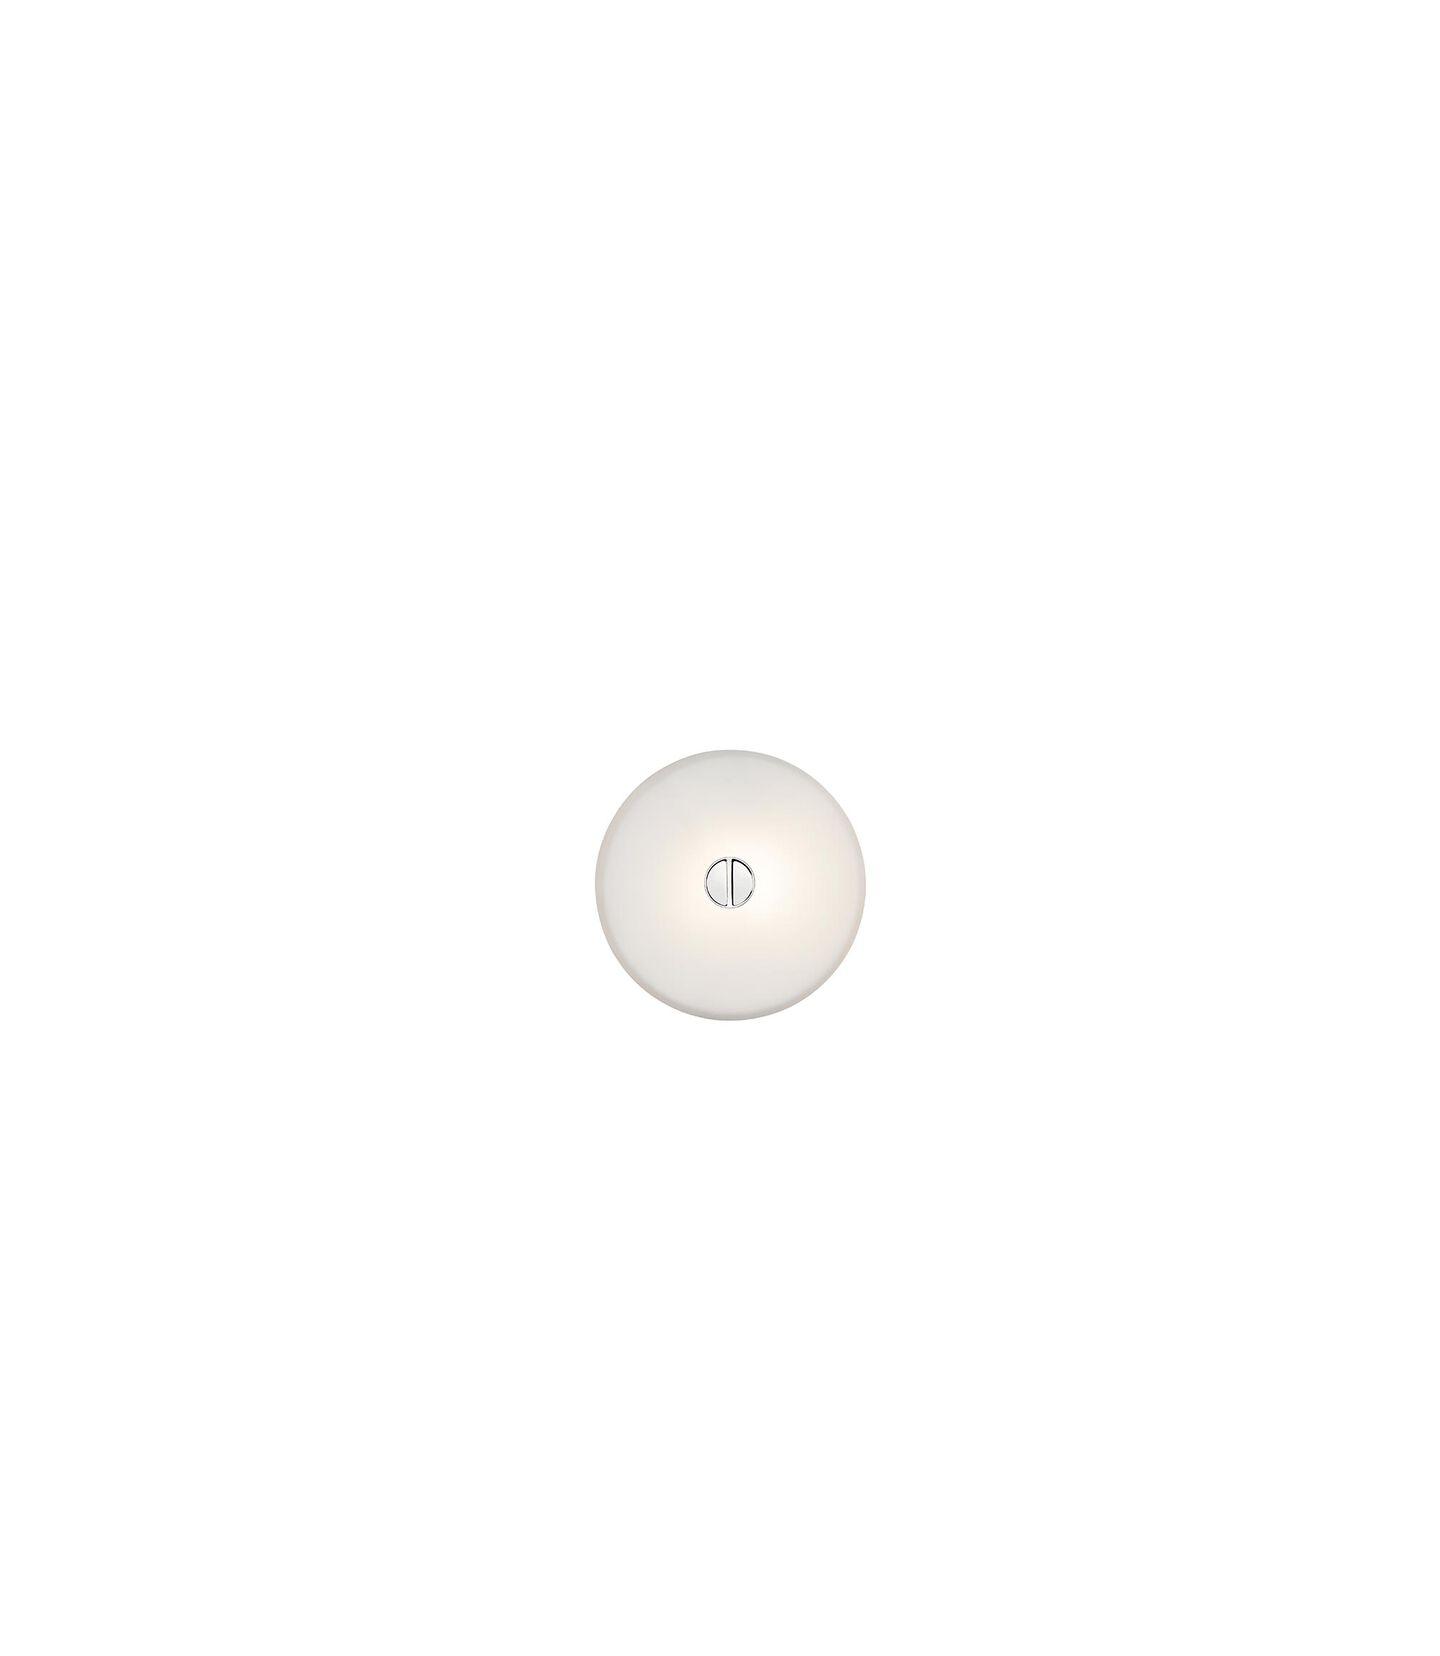 mini-button-ceiling-wall-lissoni-flos-F1490009-product-still-life-big-1